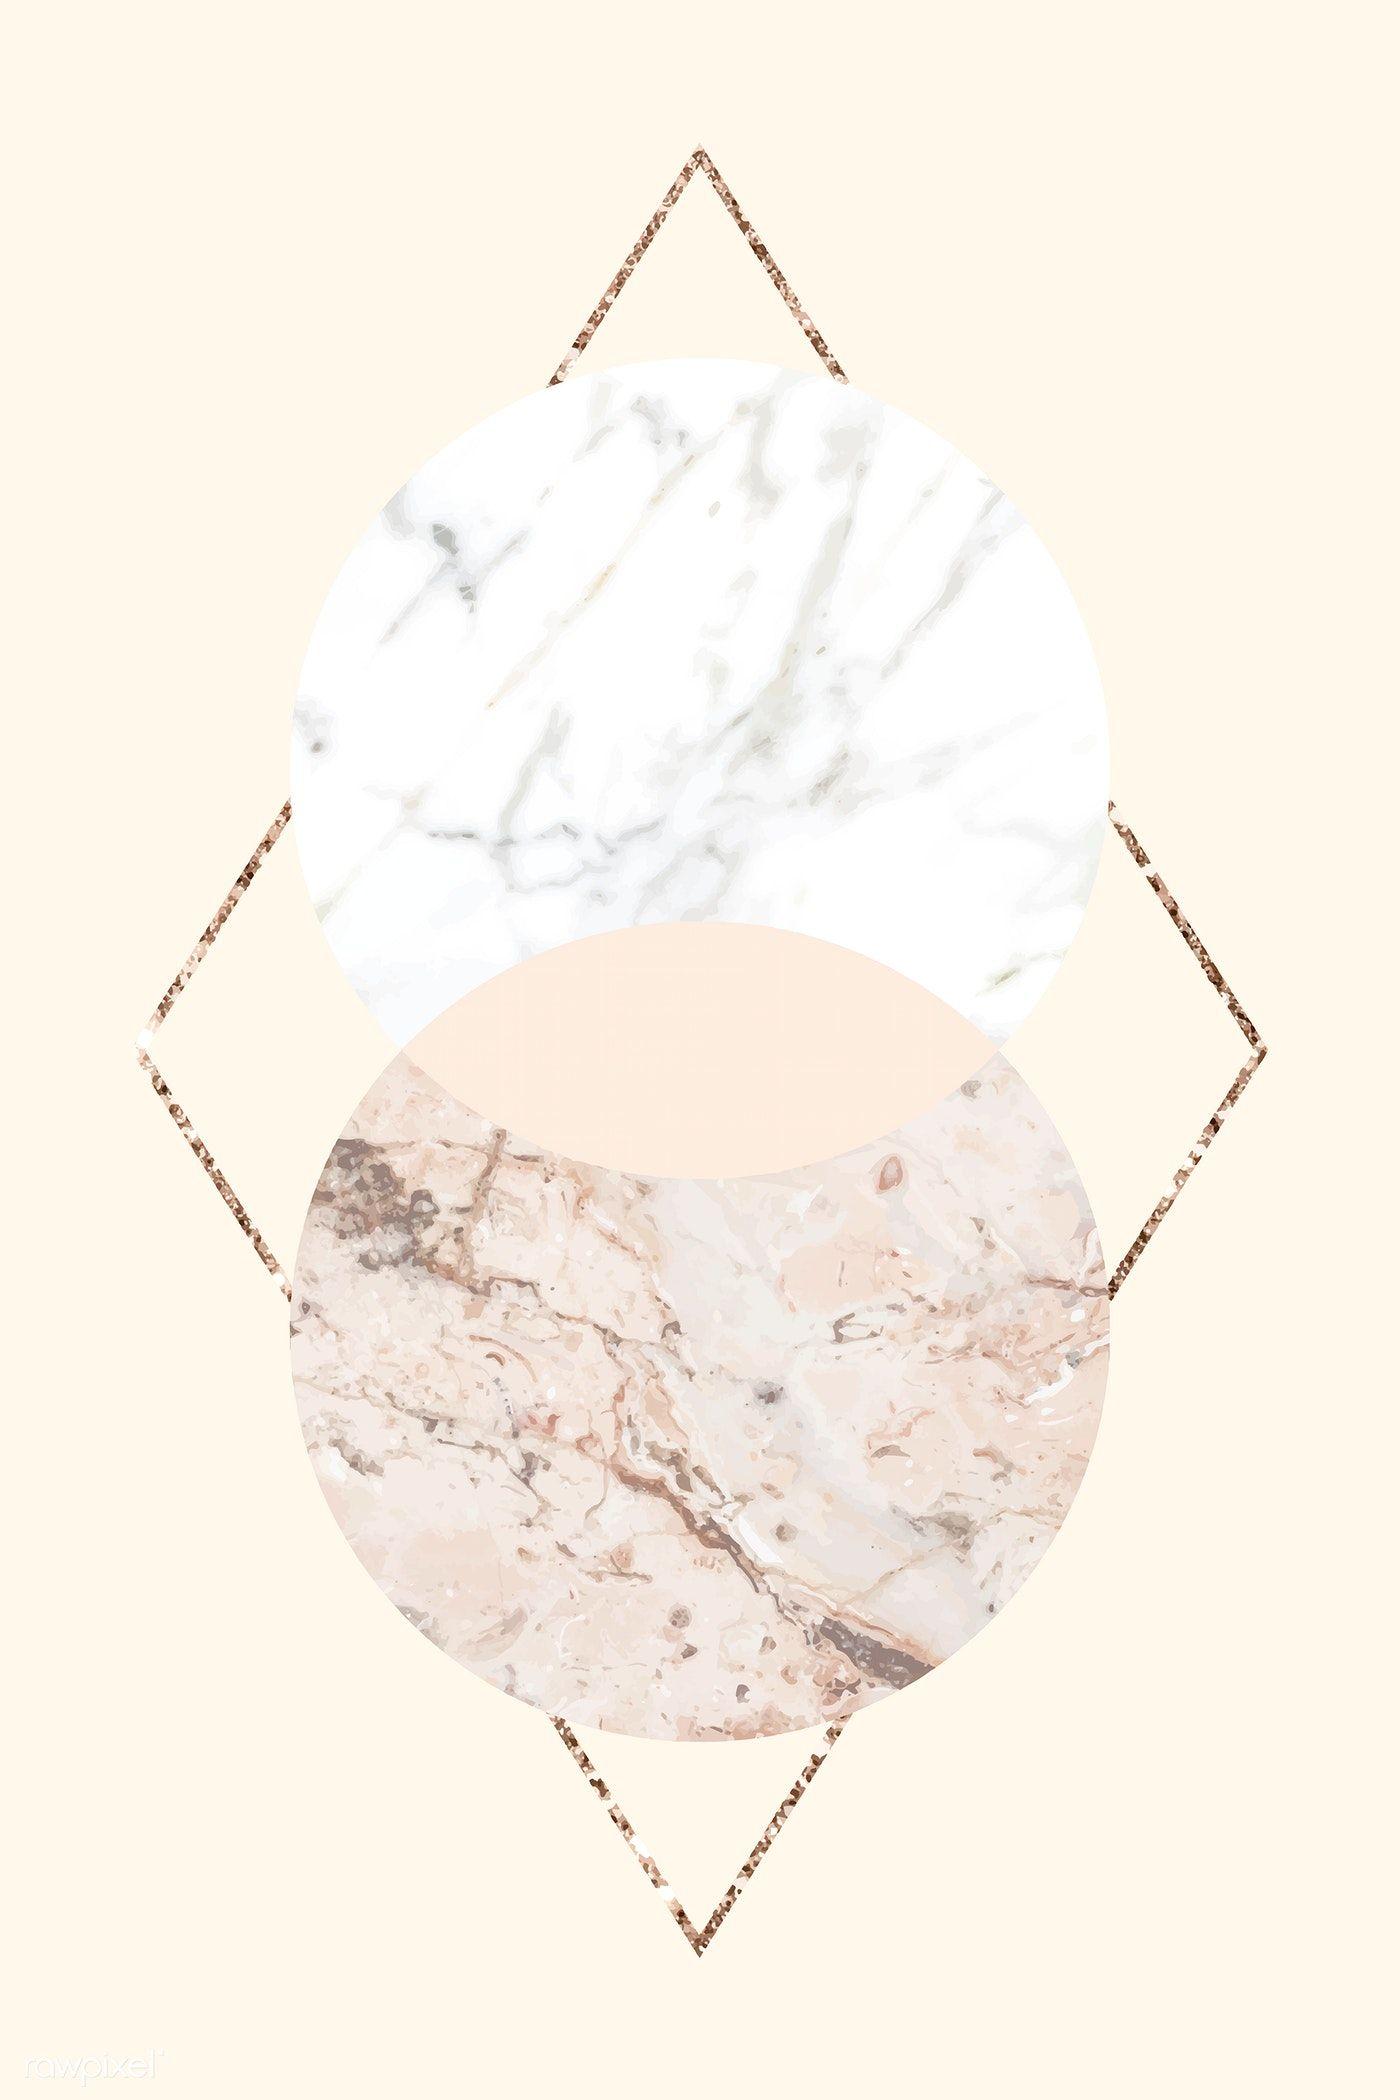 Download Premium Vector Of Round Marble Textured Frame On A Shimmering Marble Texture Texture Marble Art